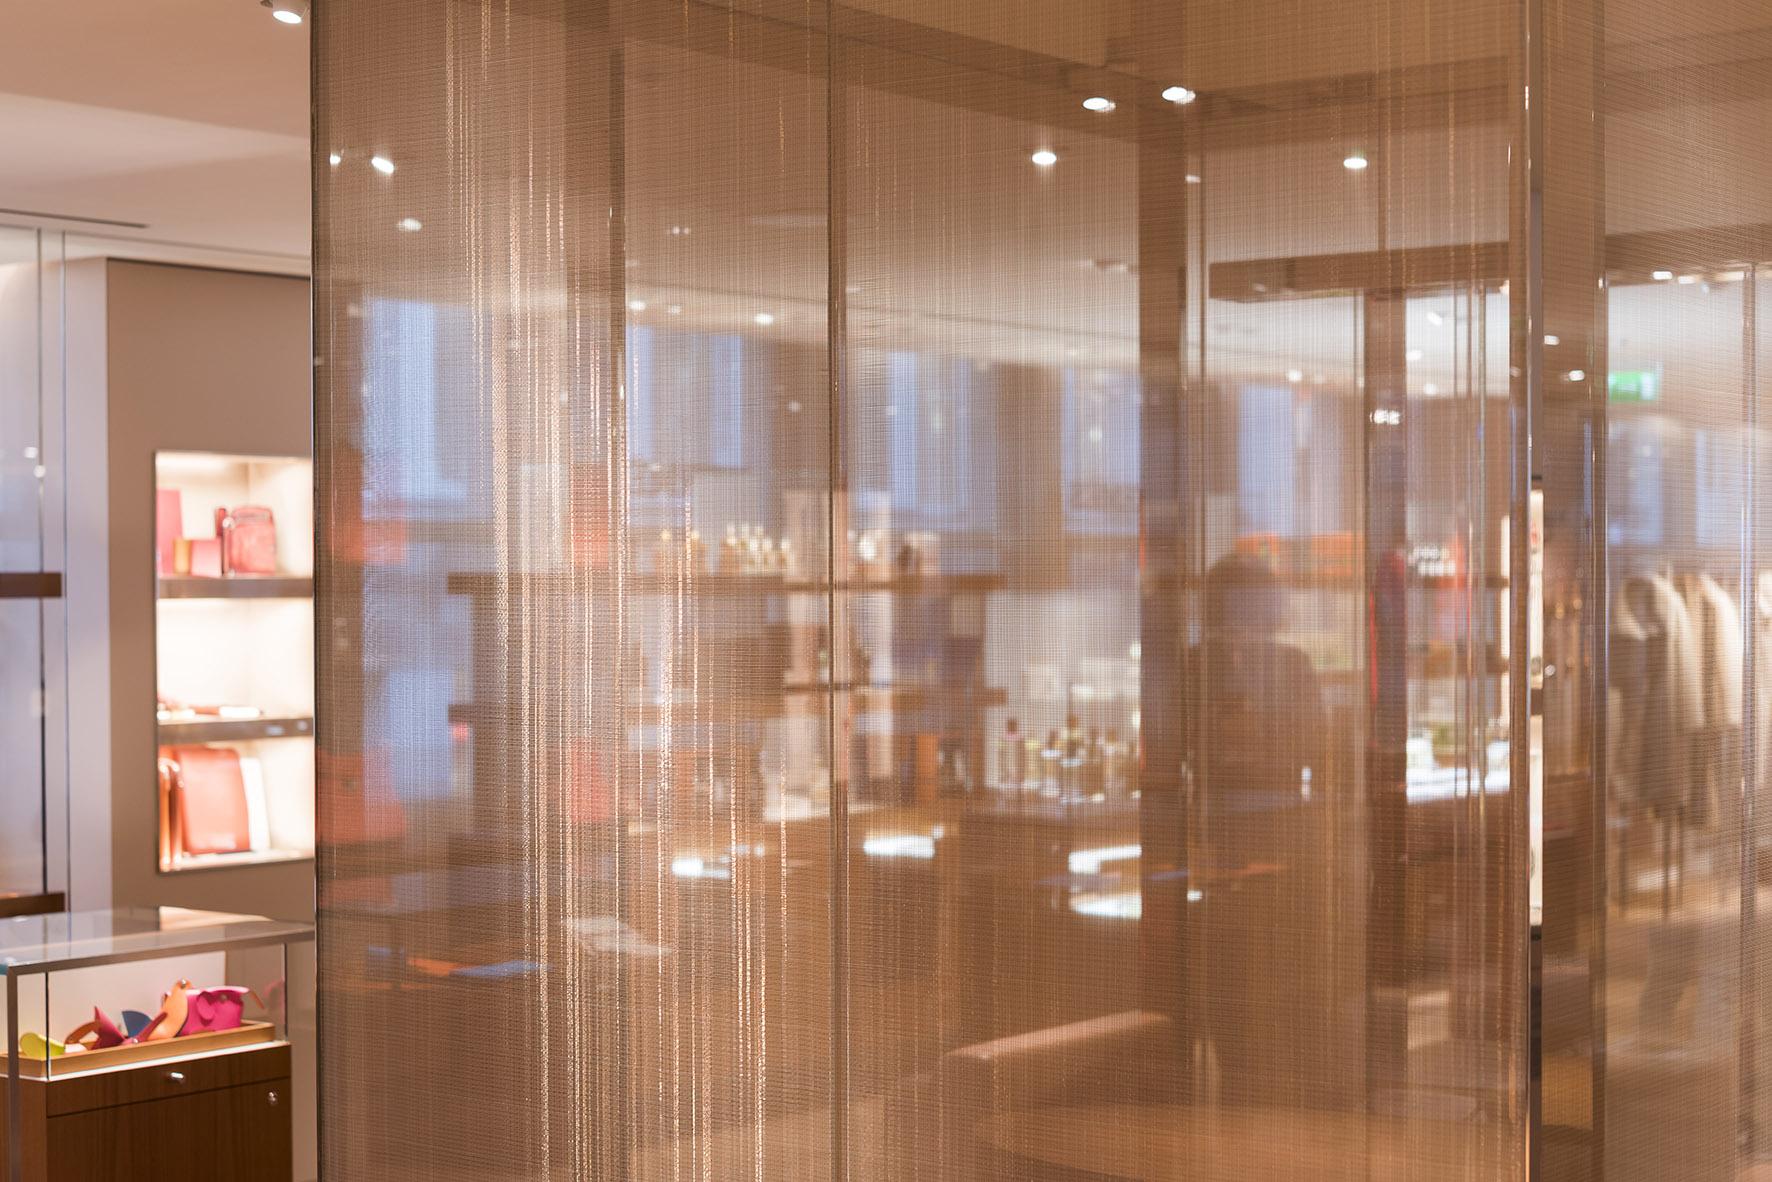 Sophie-Mallebranche-Hermes-Bons-Street-London-Glass-Lamination-Elevator-Fixed-Panels